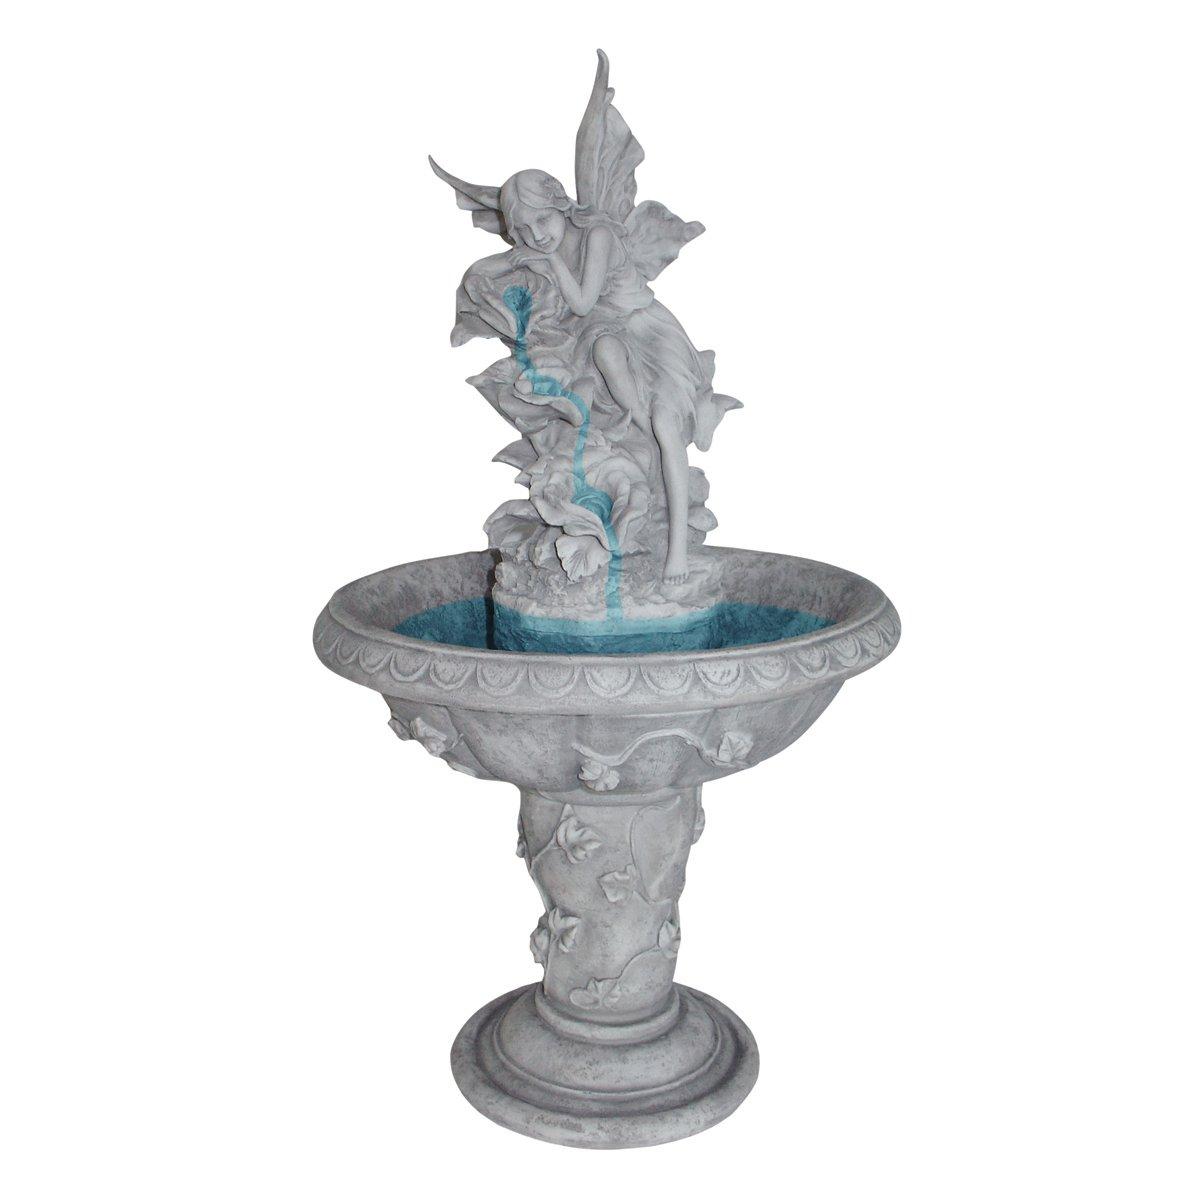 Design Toscano Pixie Fairy Sculptural Fountain, Antique Stone